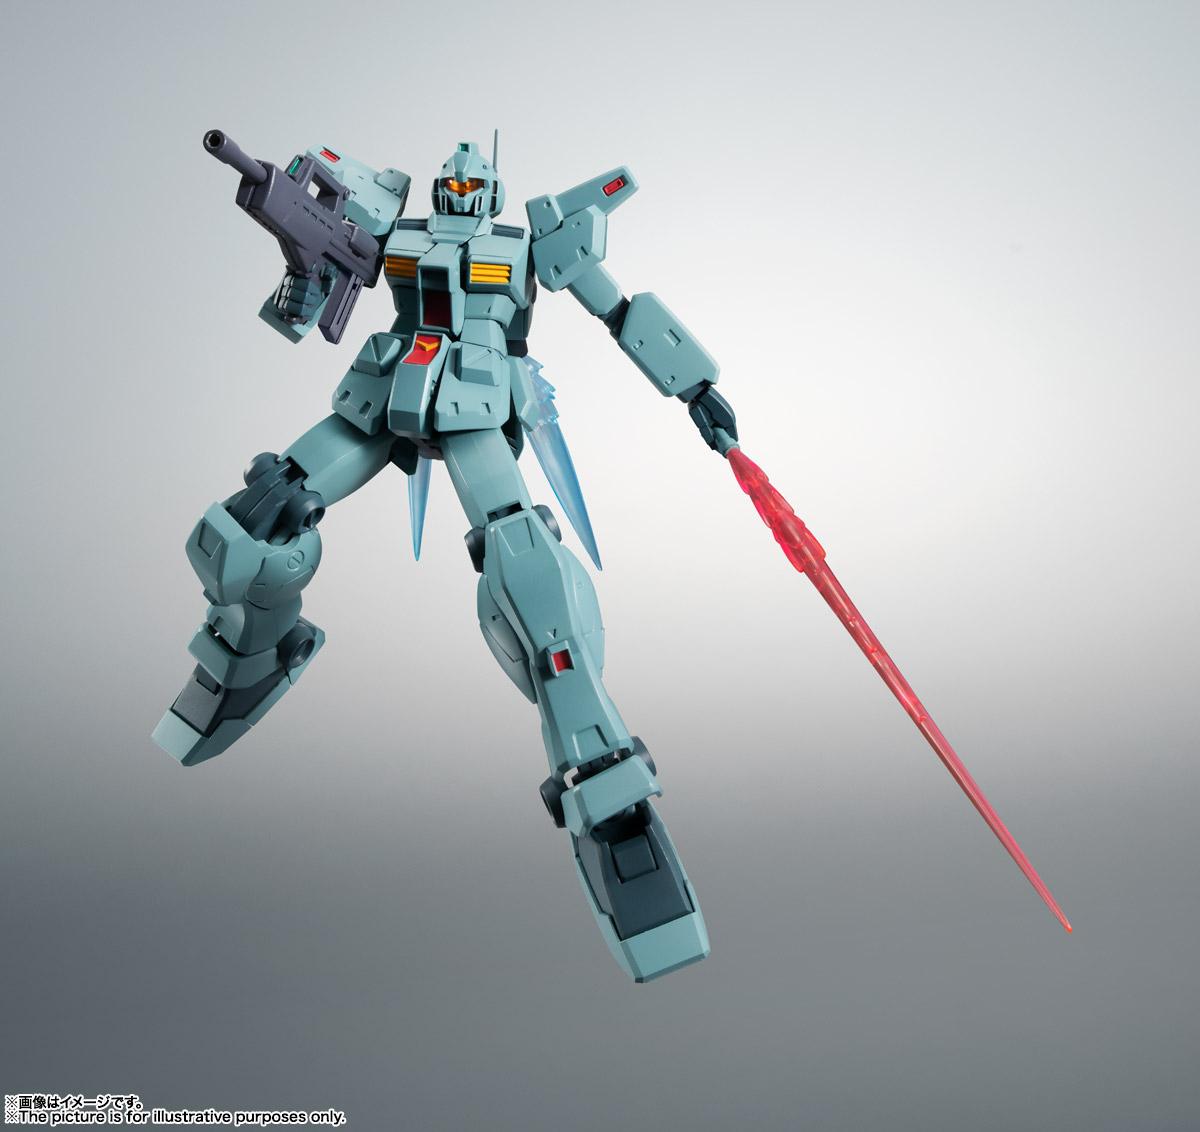 ROBOT魂〈SIDE MS〉『RGM-79N ジム・カスタム ver. A.N.I.M.E.』ガンダム0083 可動フィギュア-006